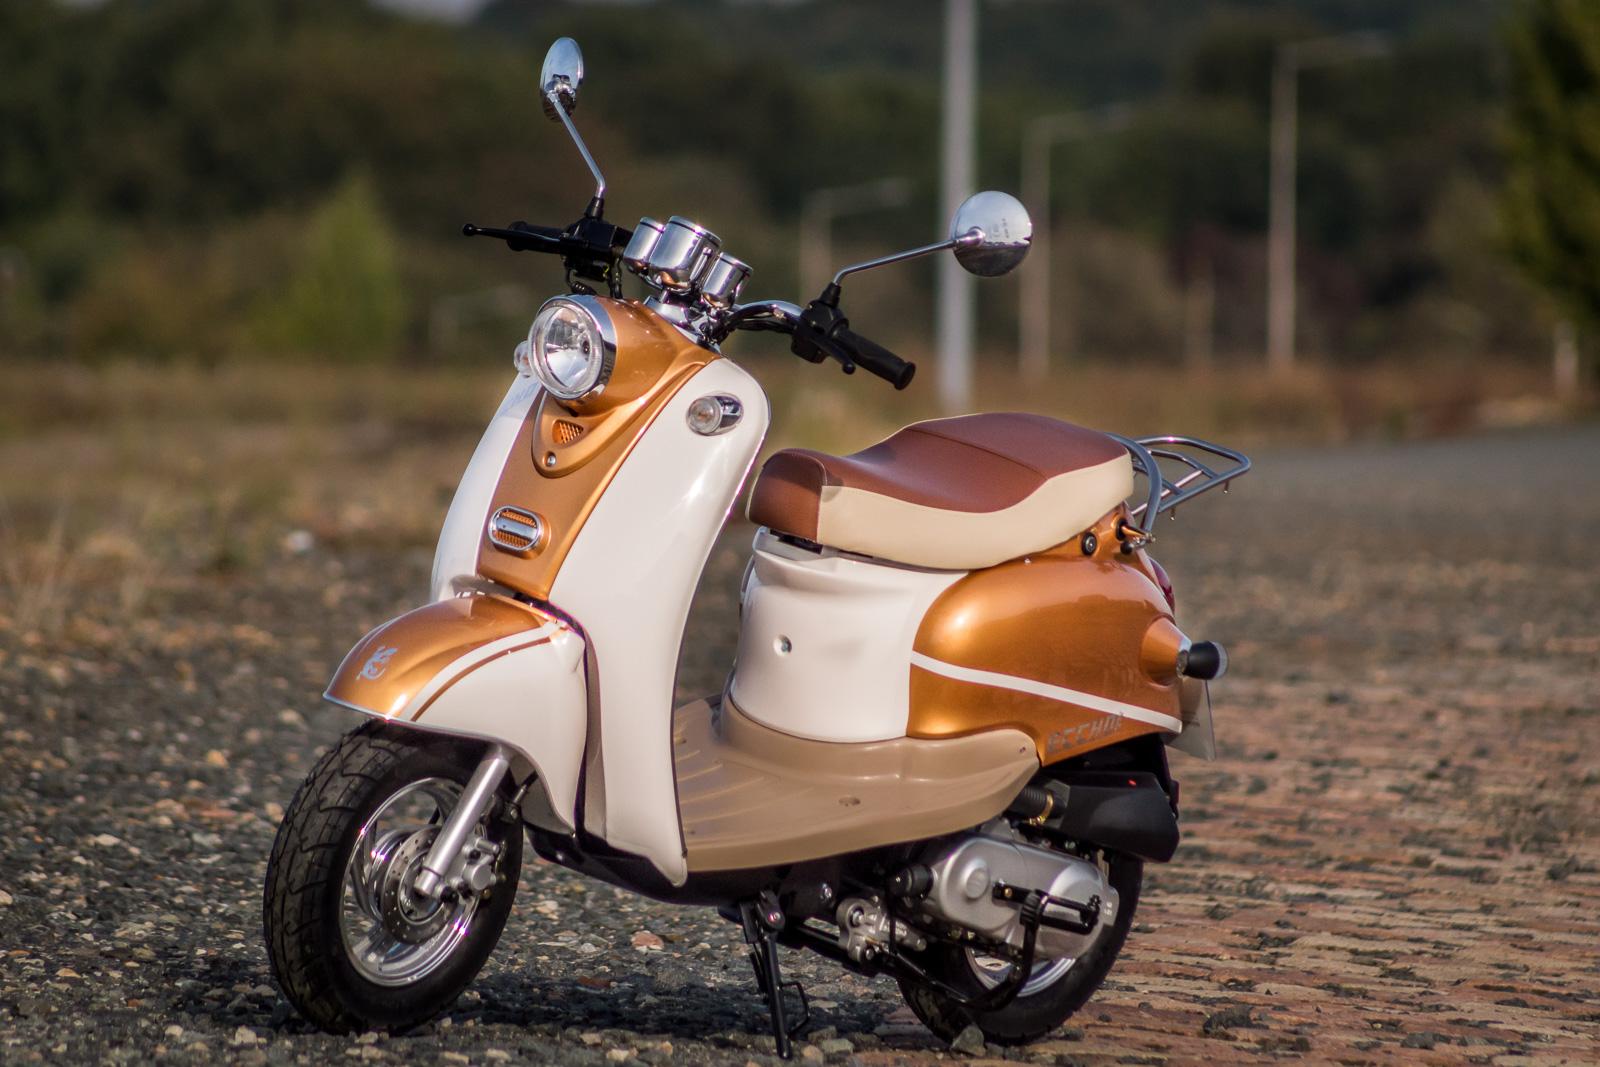 scooter yy50qt15 golder scooters eccho cholet acheter. Black Bedroom Furniture Sets. Home Design Ideas